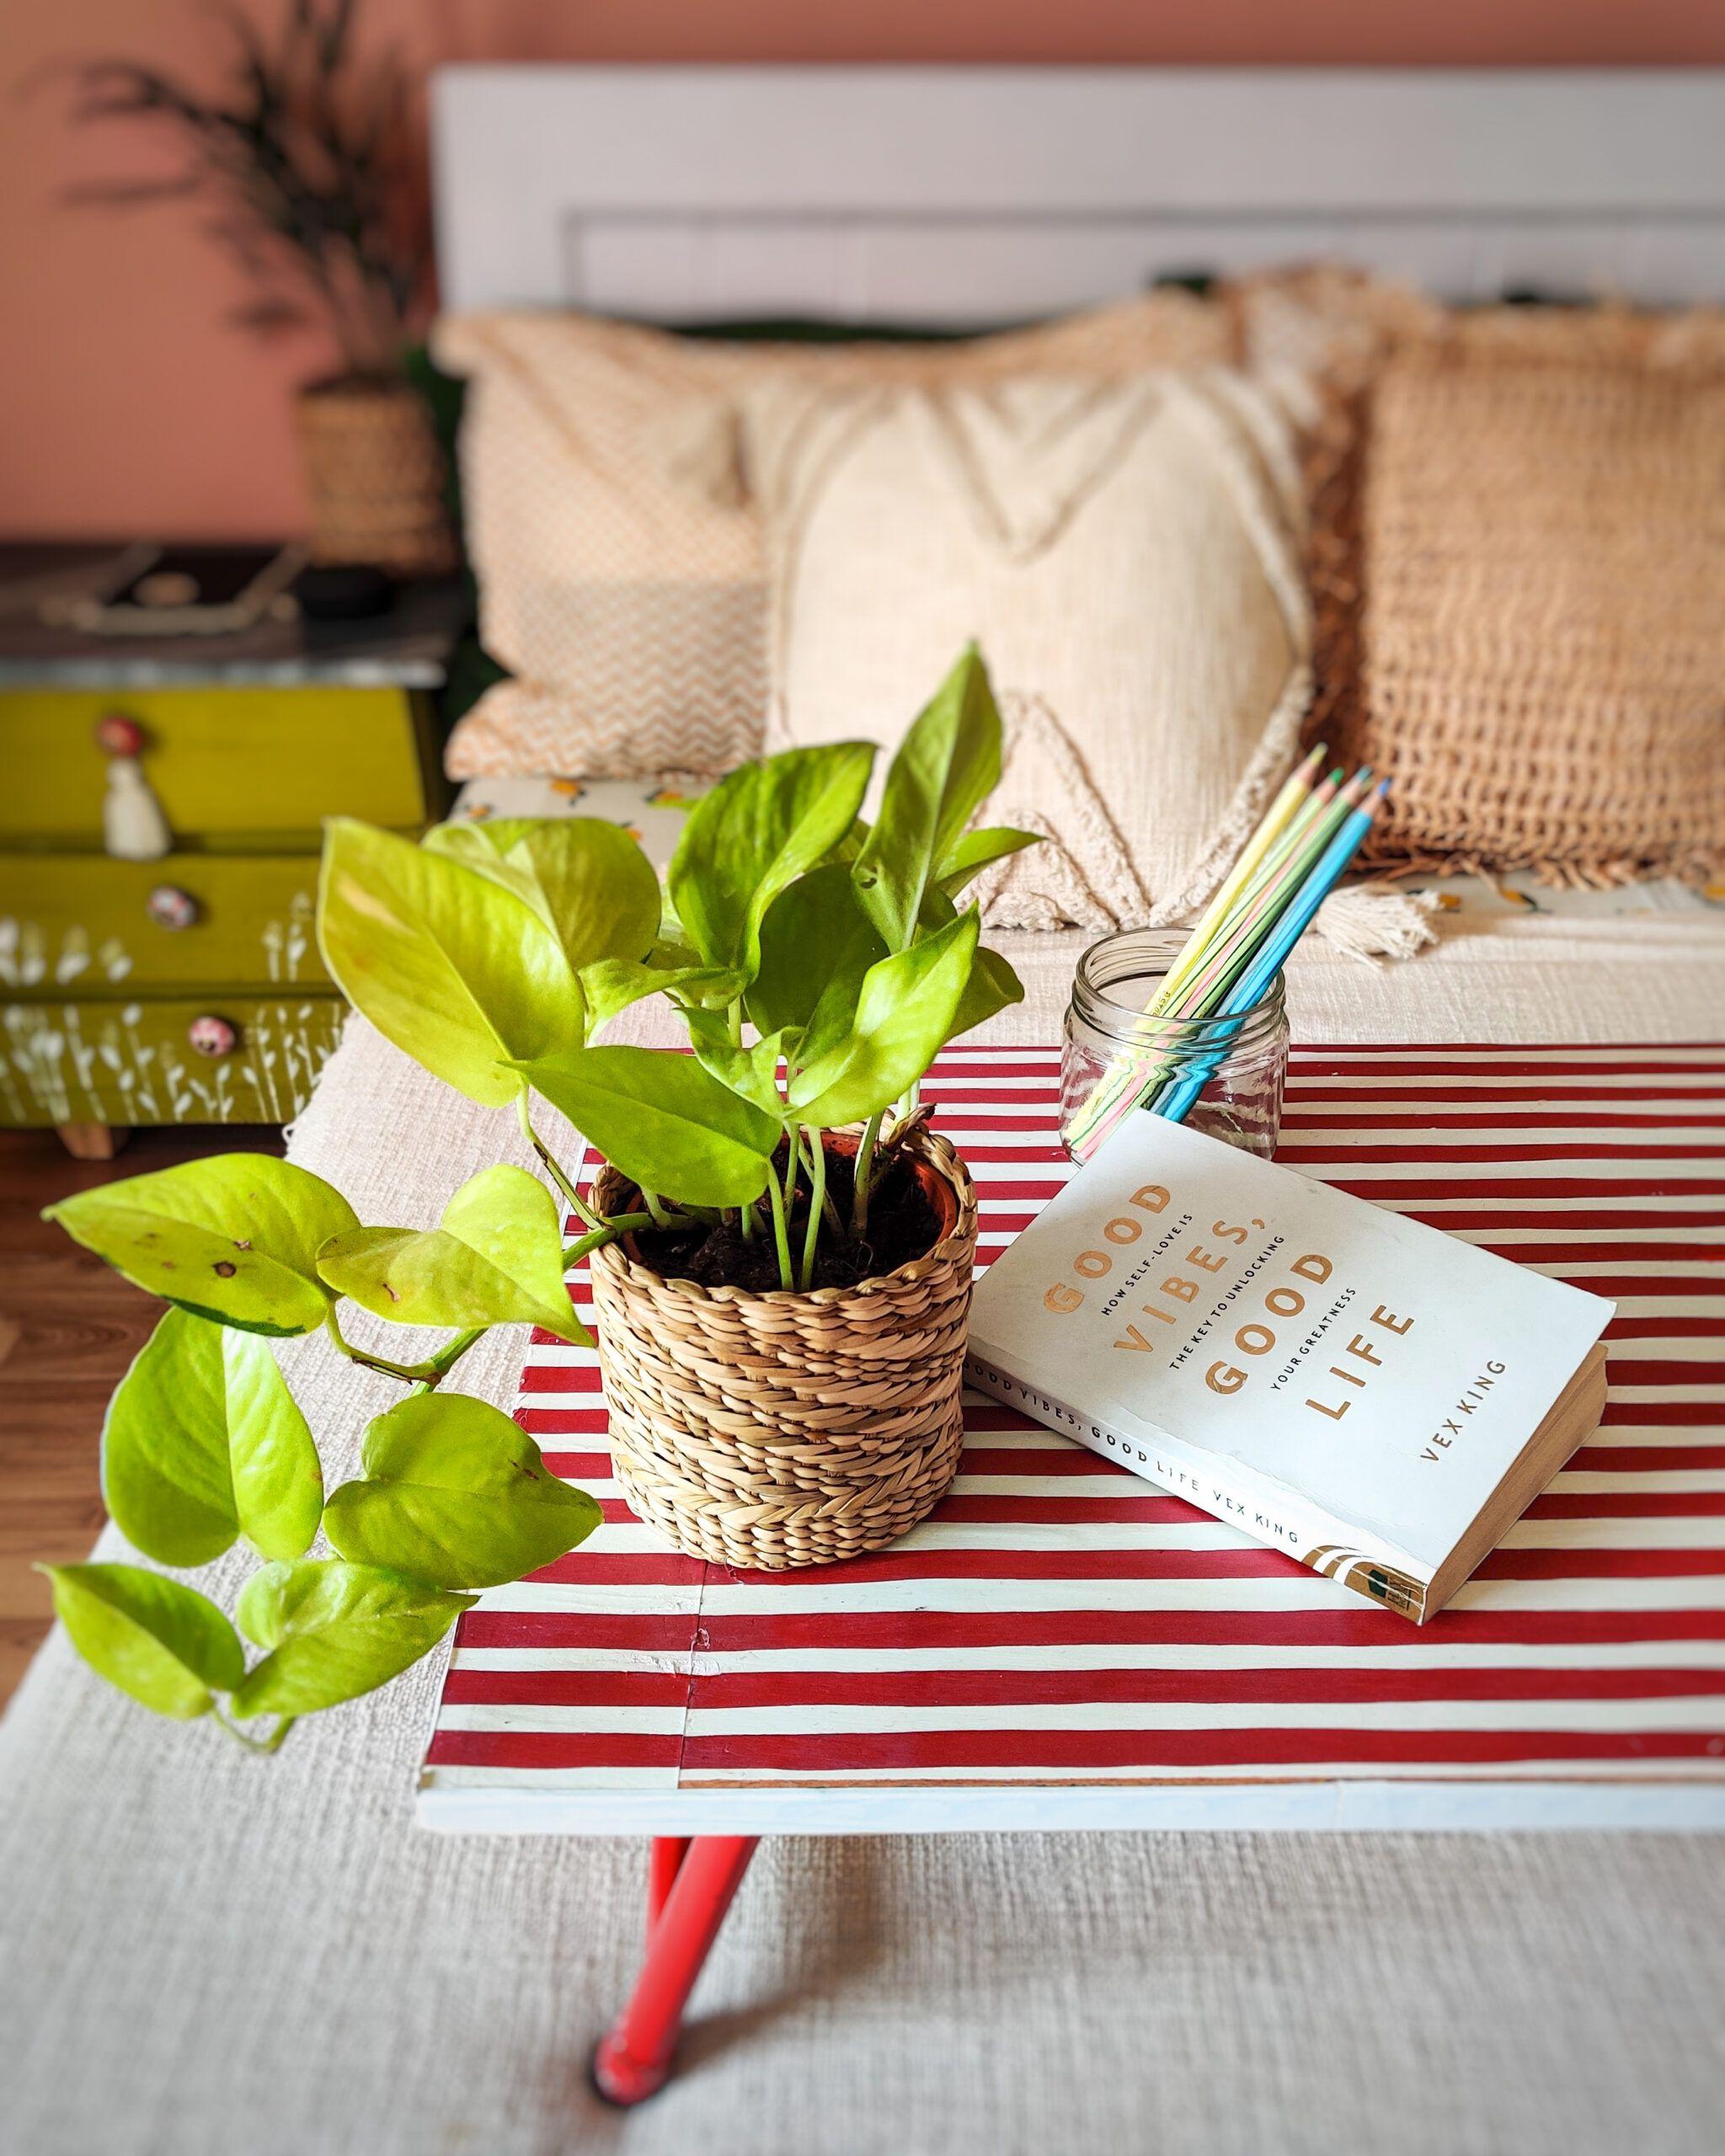 diy home decor crafts-decoupage table